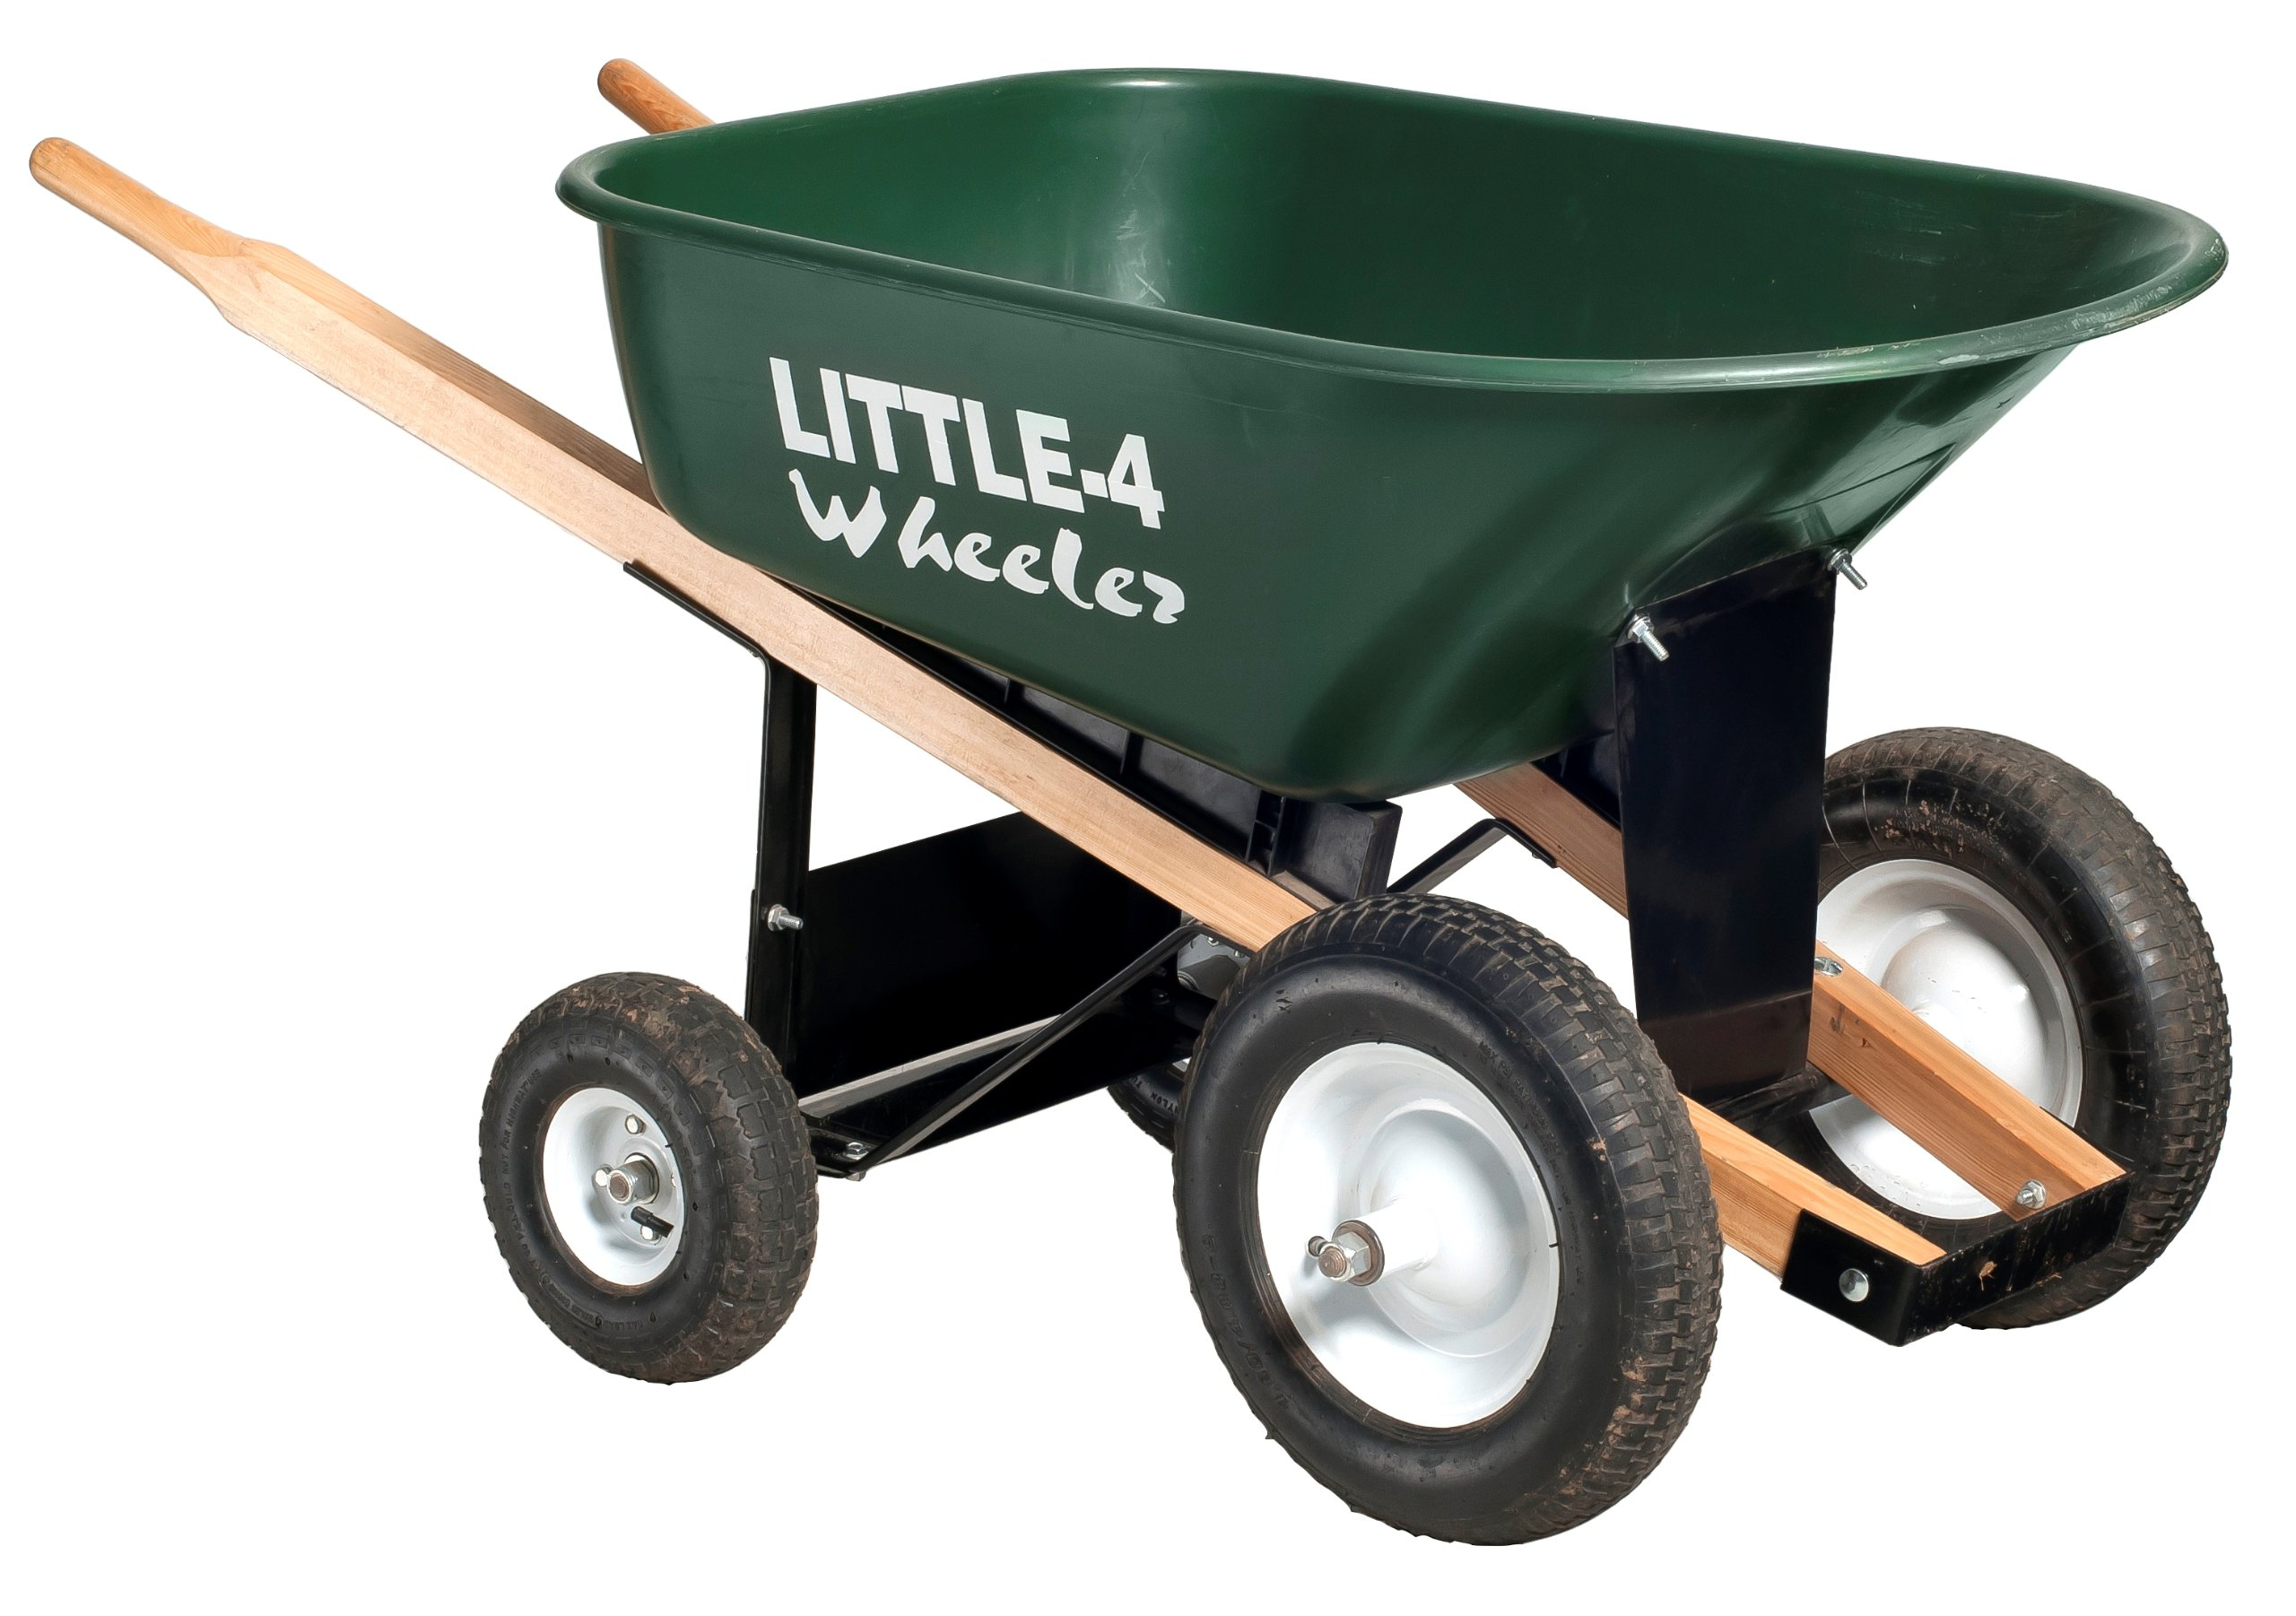 Big 4 Wheeler Heavy-Duty Wheelbarrow, 6 Cubic Feet by Big 4 Wheeler